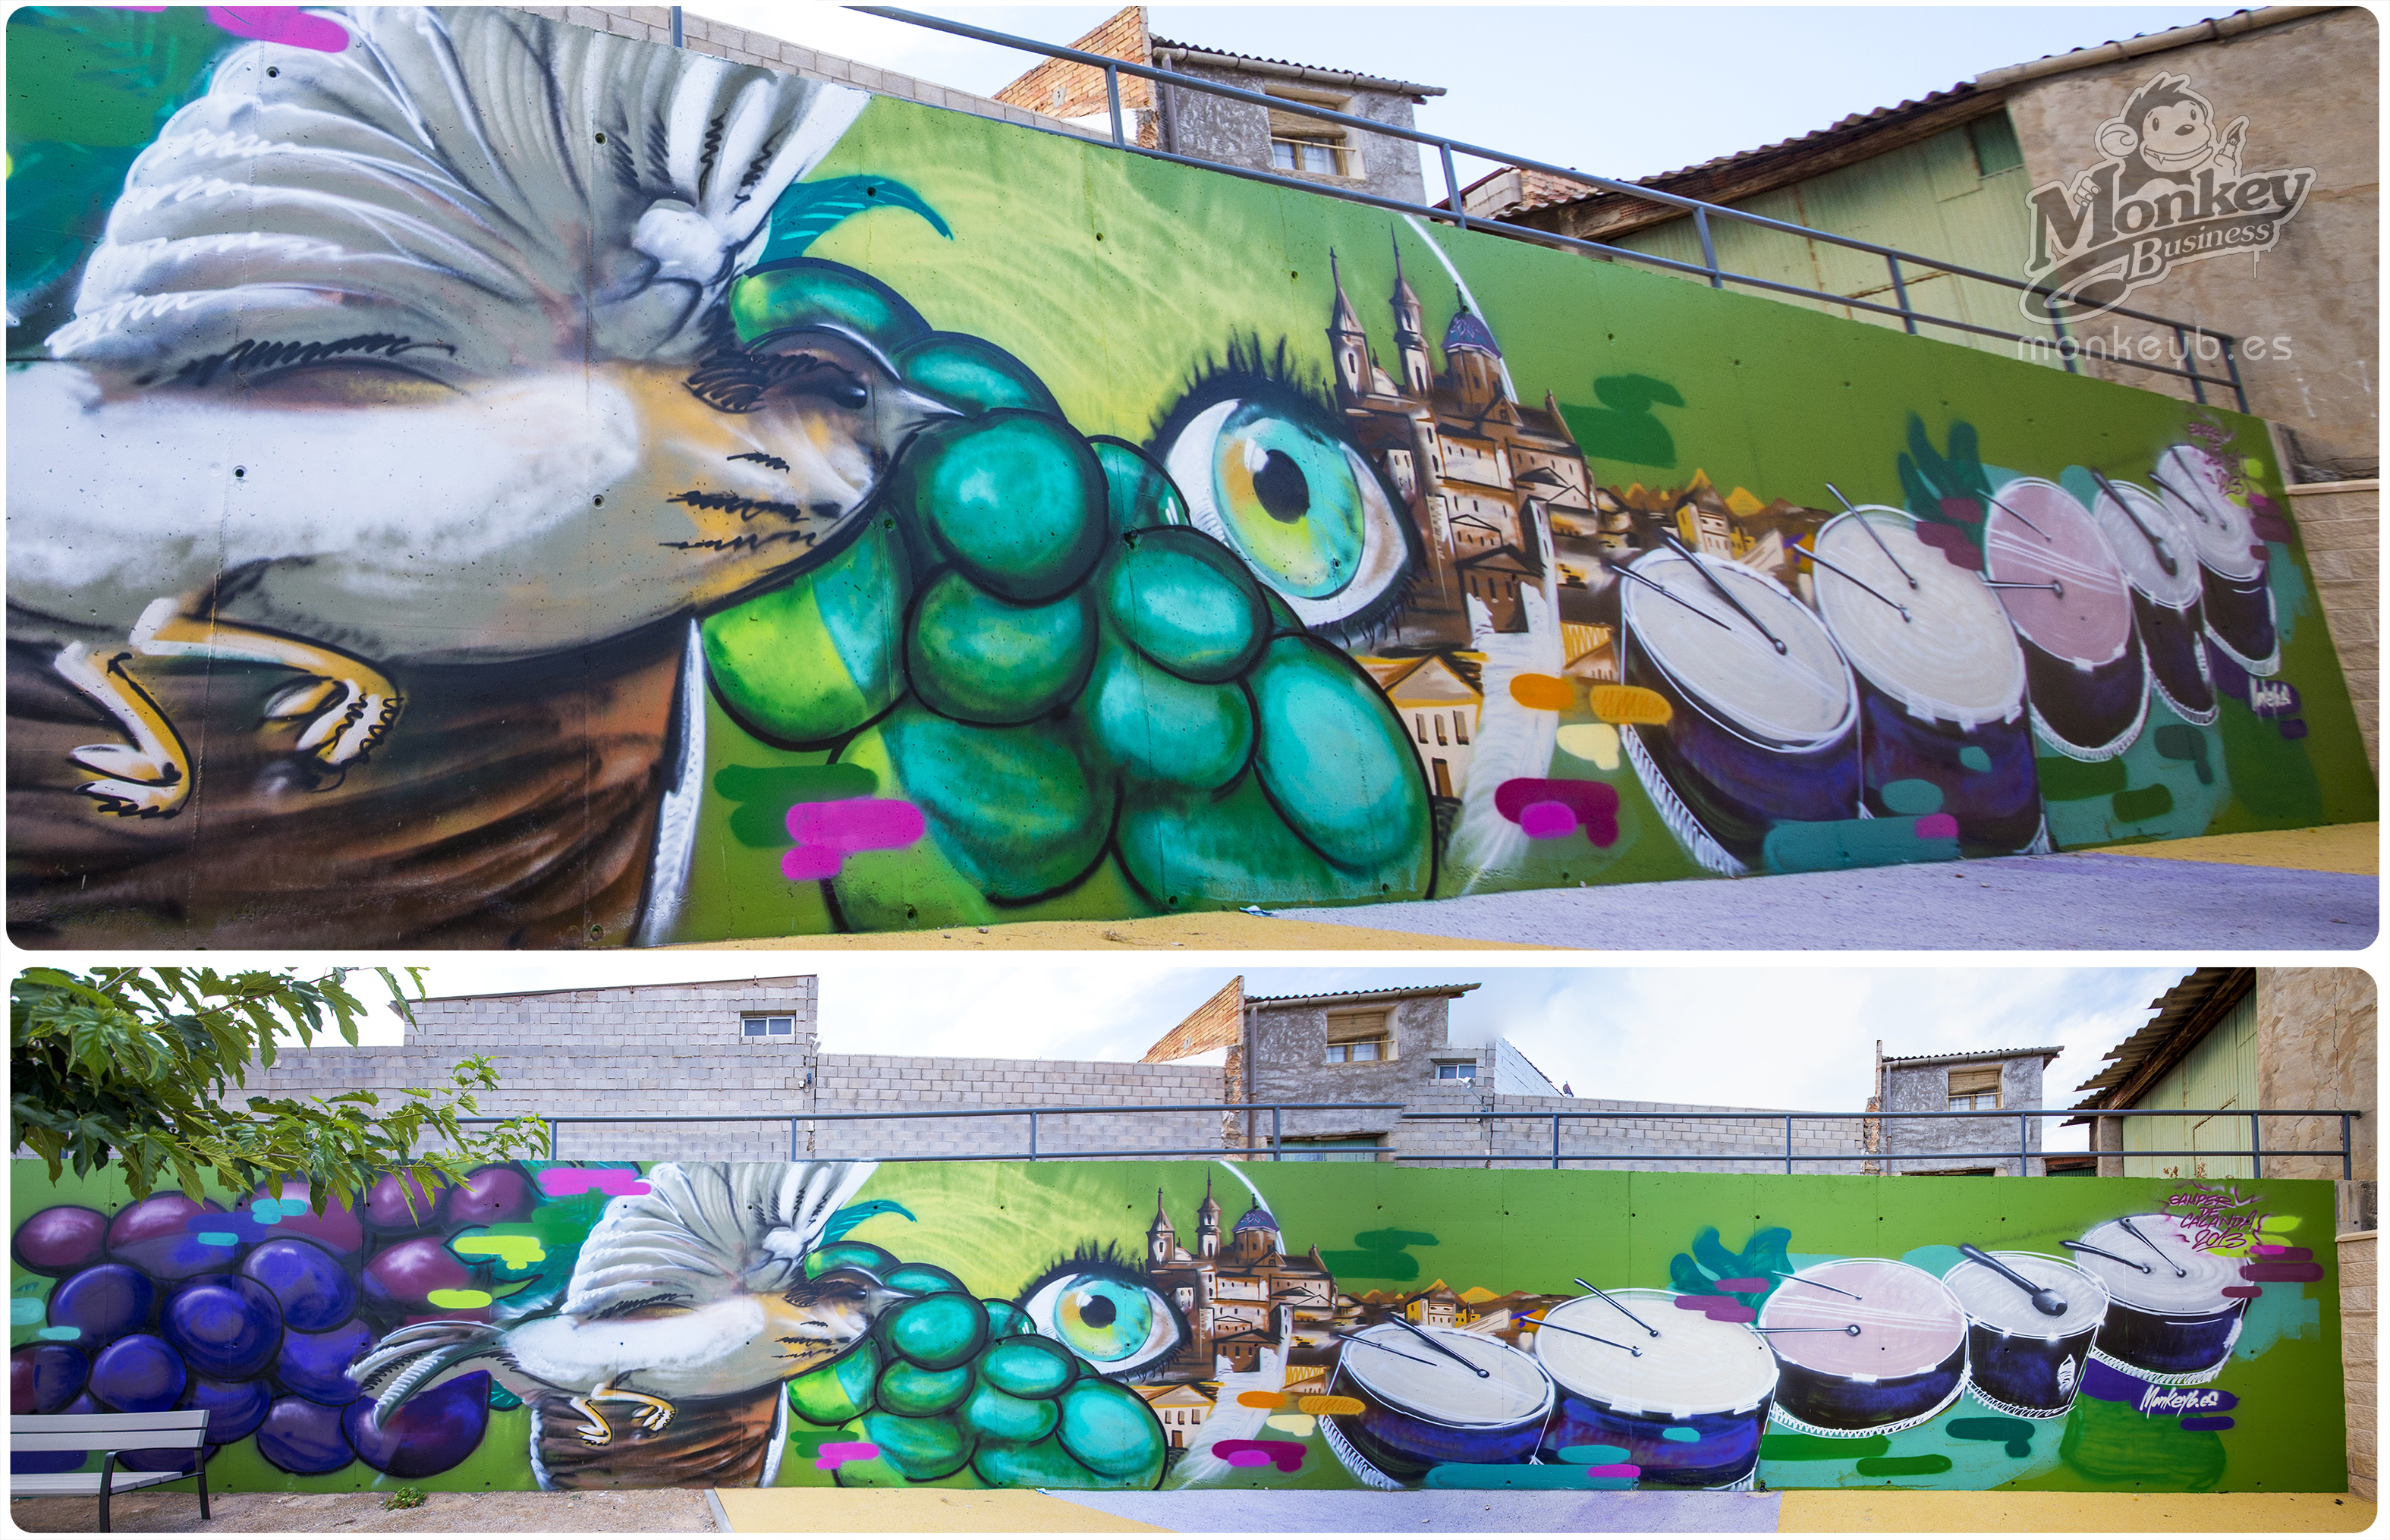 samper de calanda graffiti parque livepainting